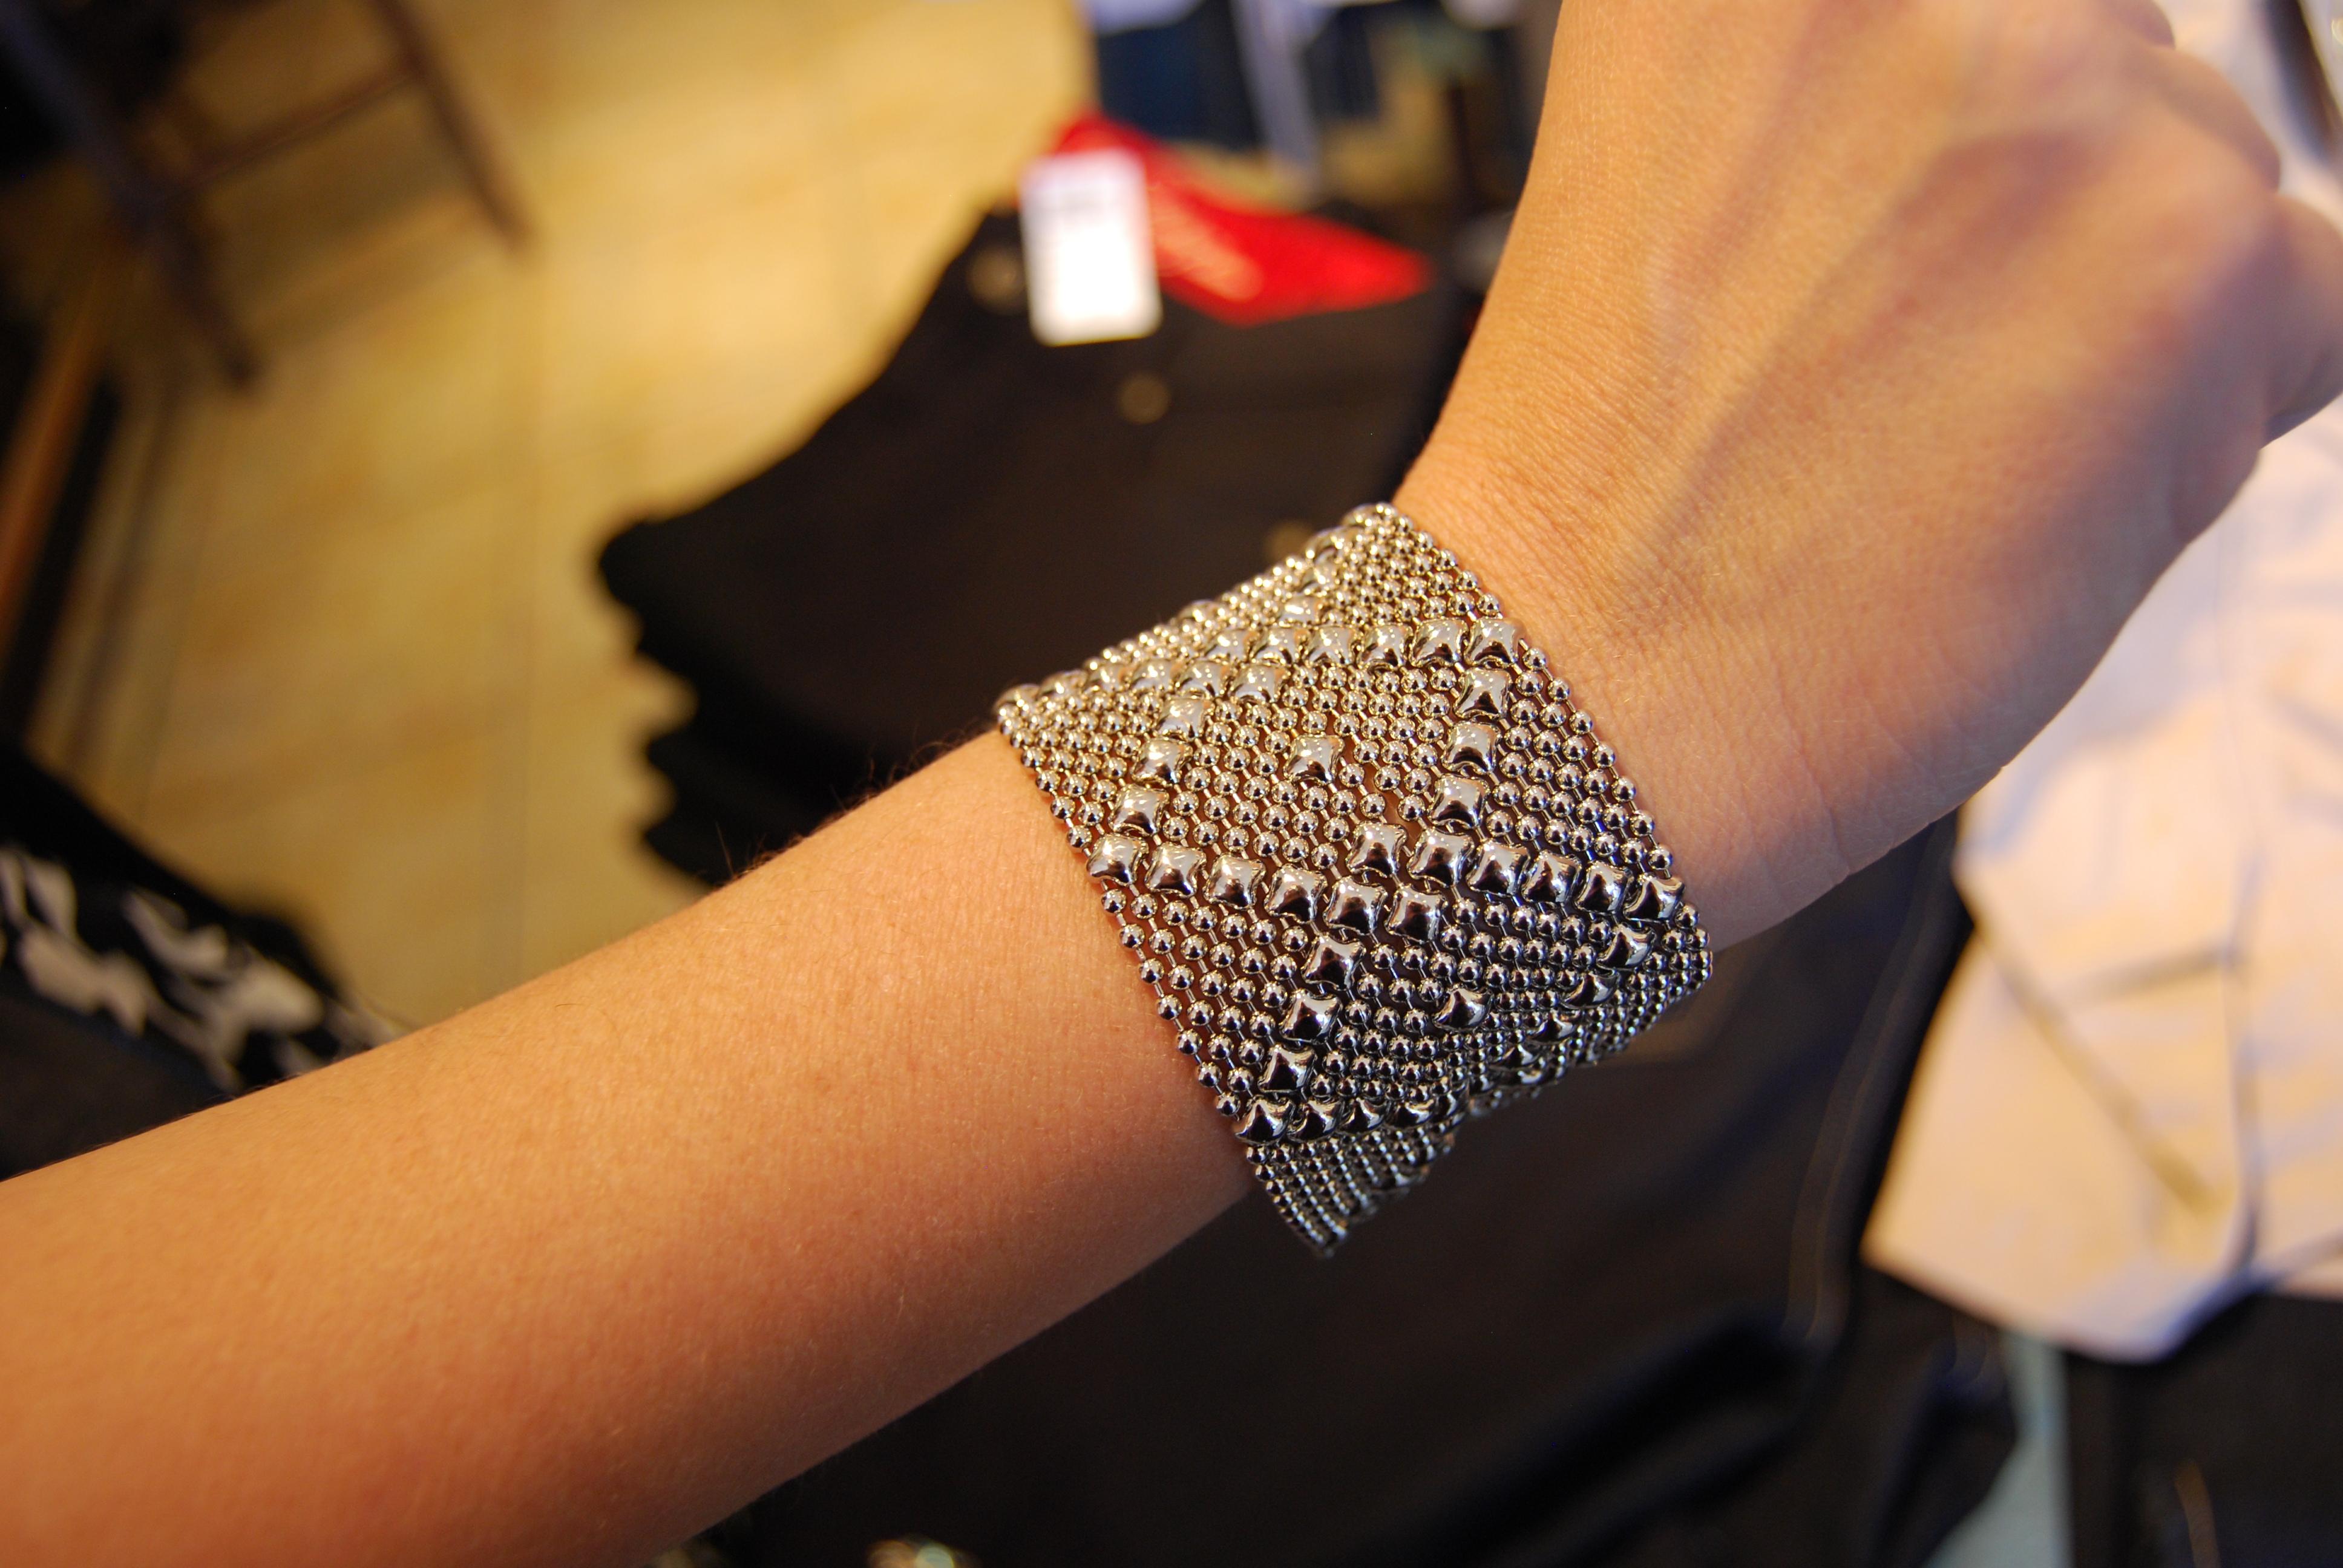 This Criss Cross Nickel Bracelet By Liquid Metal